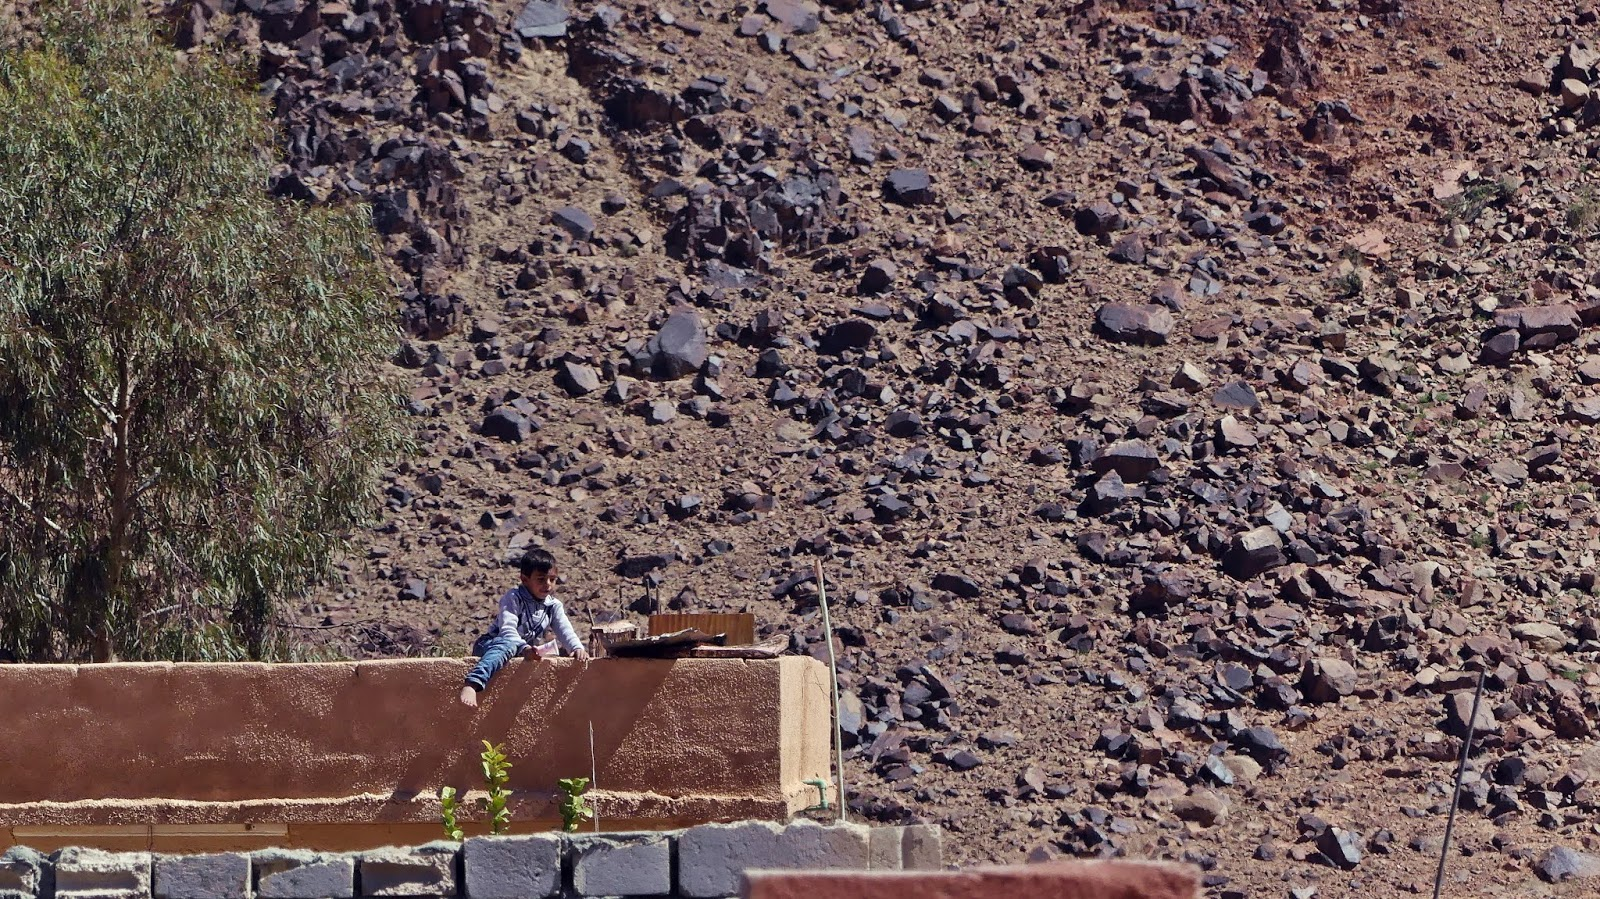 Jordania Wioska Wadi Rum dzieci